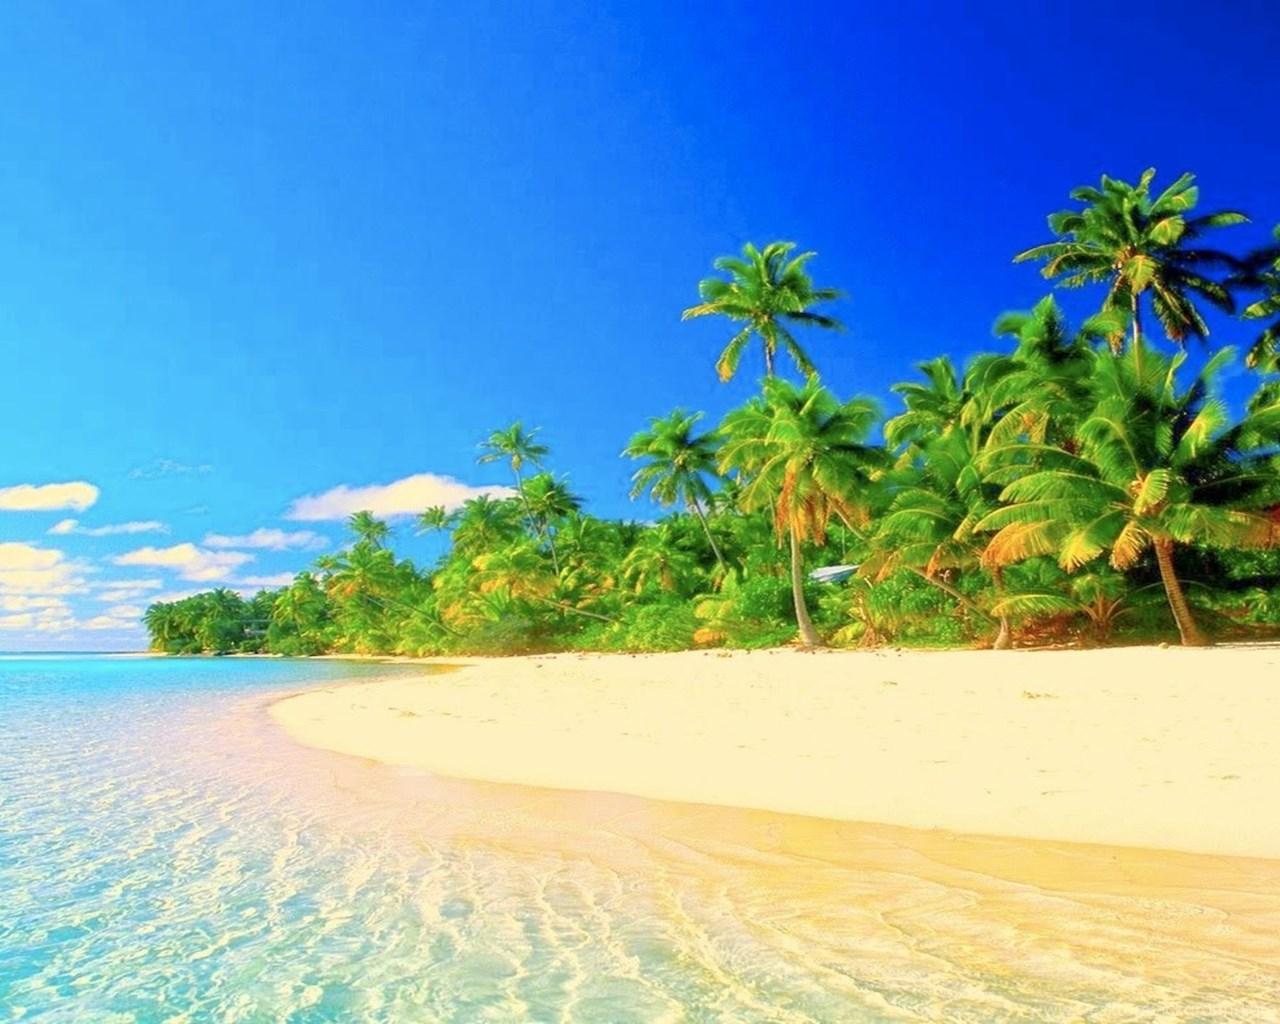 Tropical Paradise Beach Hd Wallpaper For Nexus 7 Screens: Tropical Paradise Collection (37+) Desktop Background